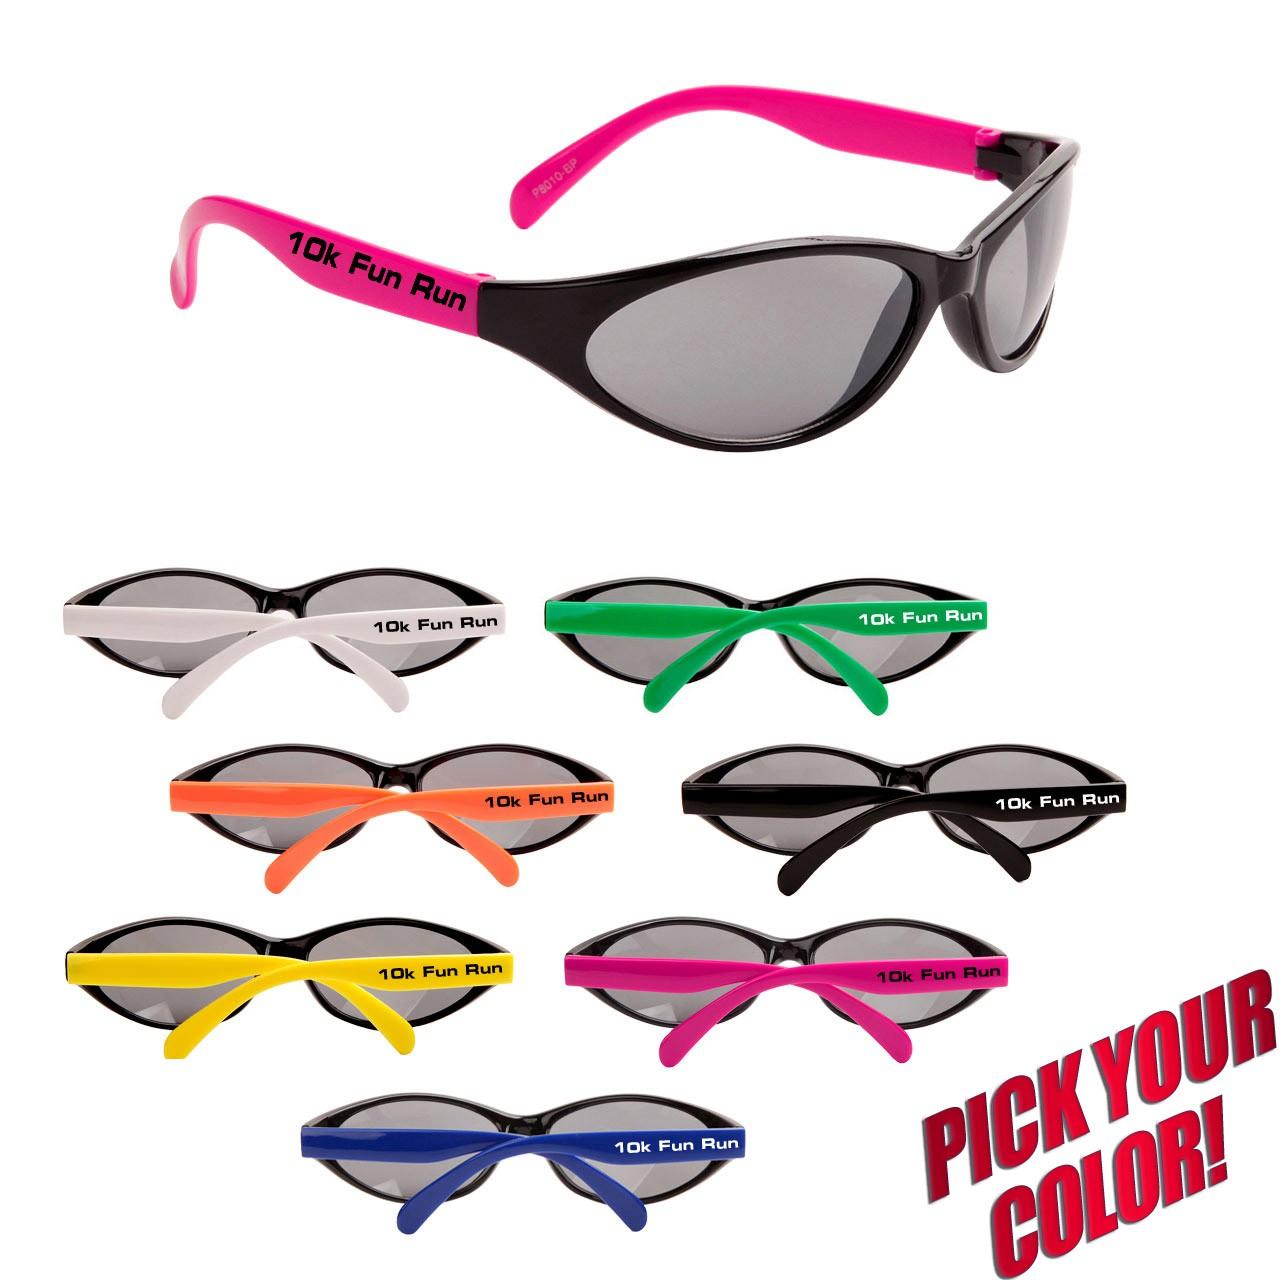 Cheap Personalized NY Sunglasses